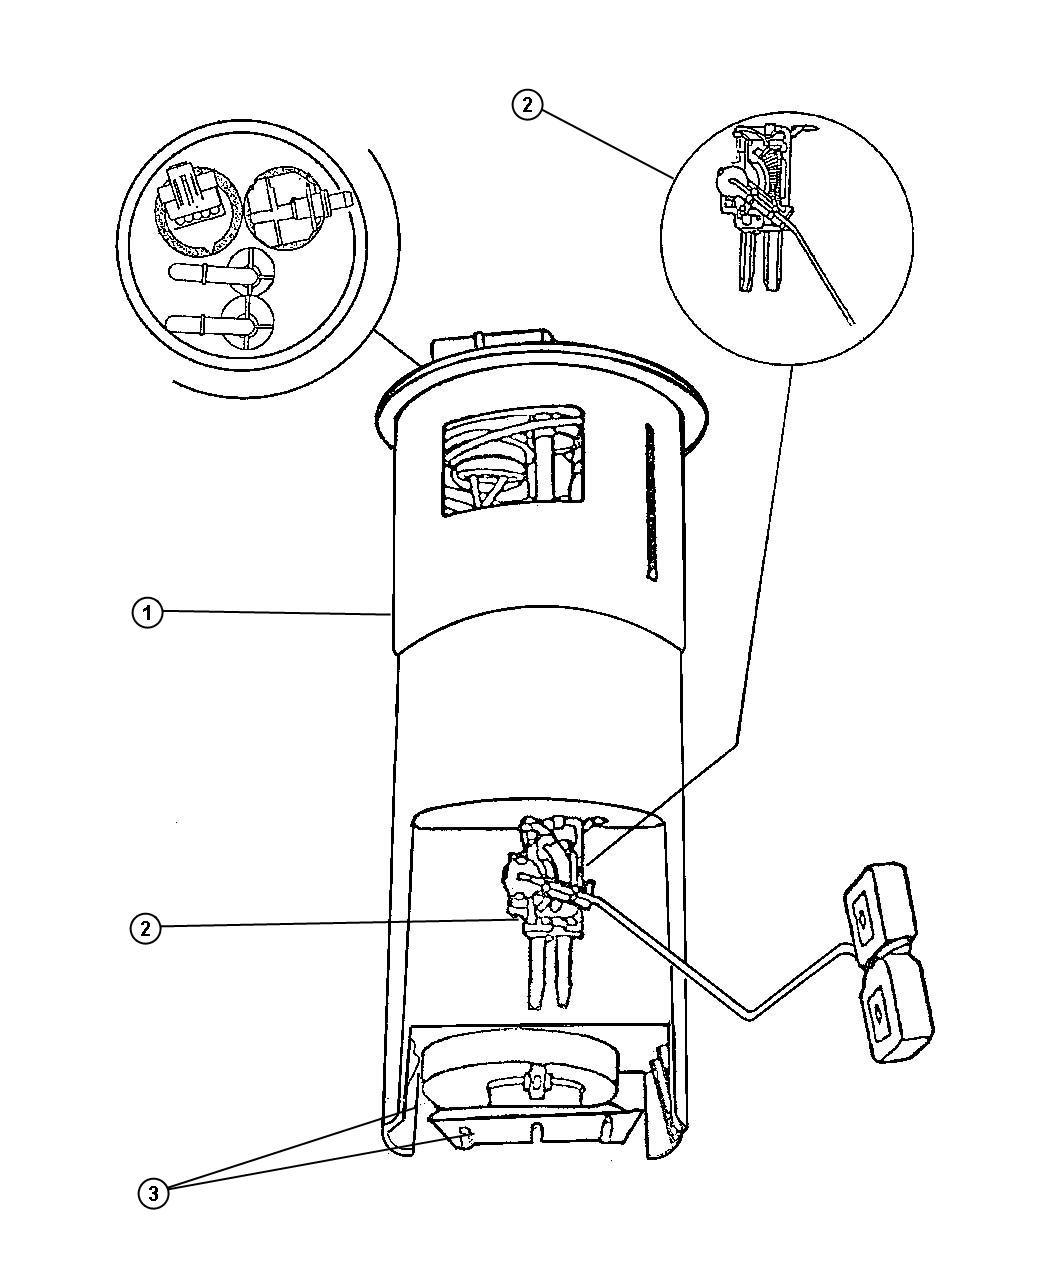 Plymouth Prowler 3 5l V6 Regulator Kit Fuel Pressure